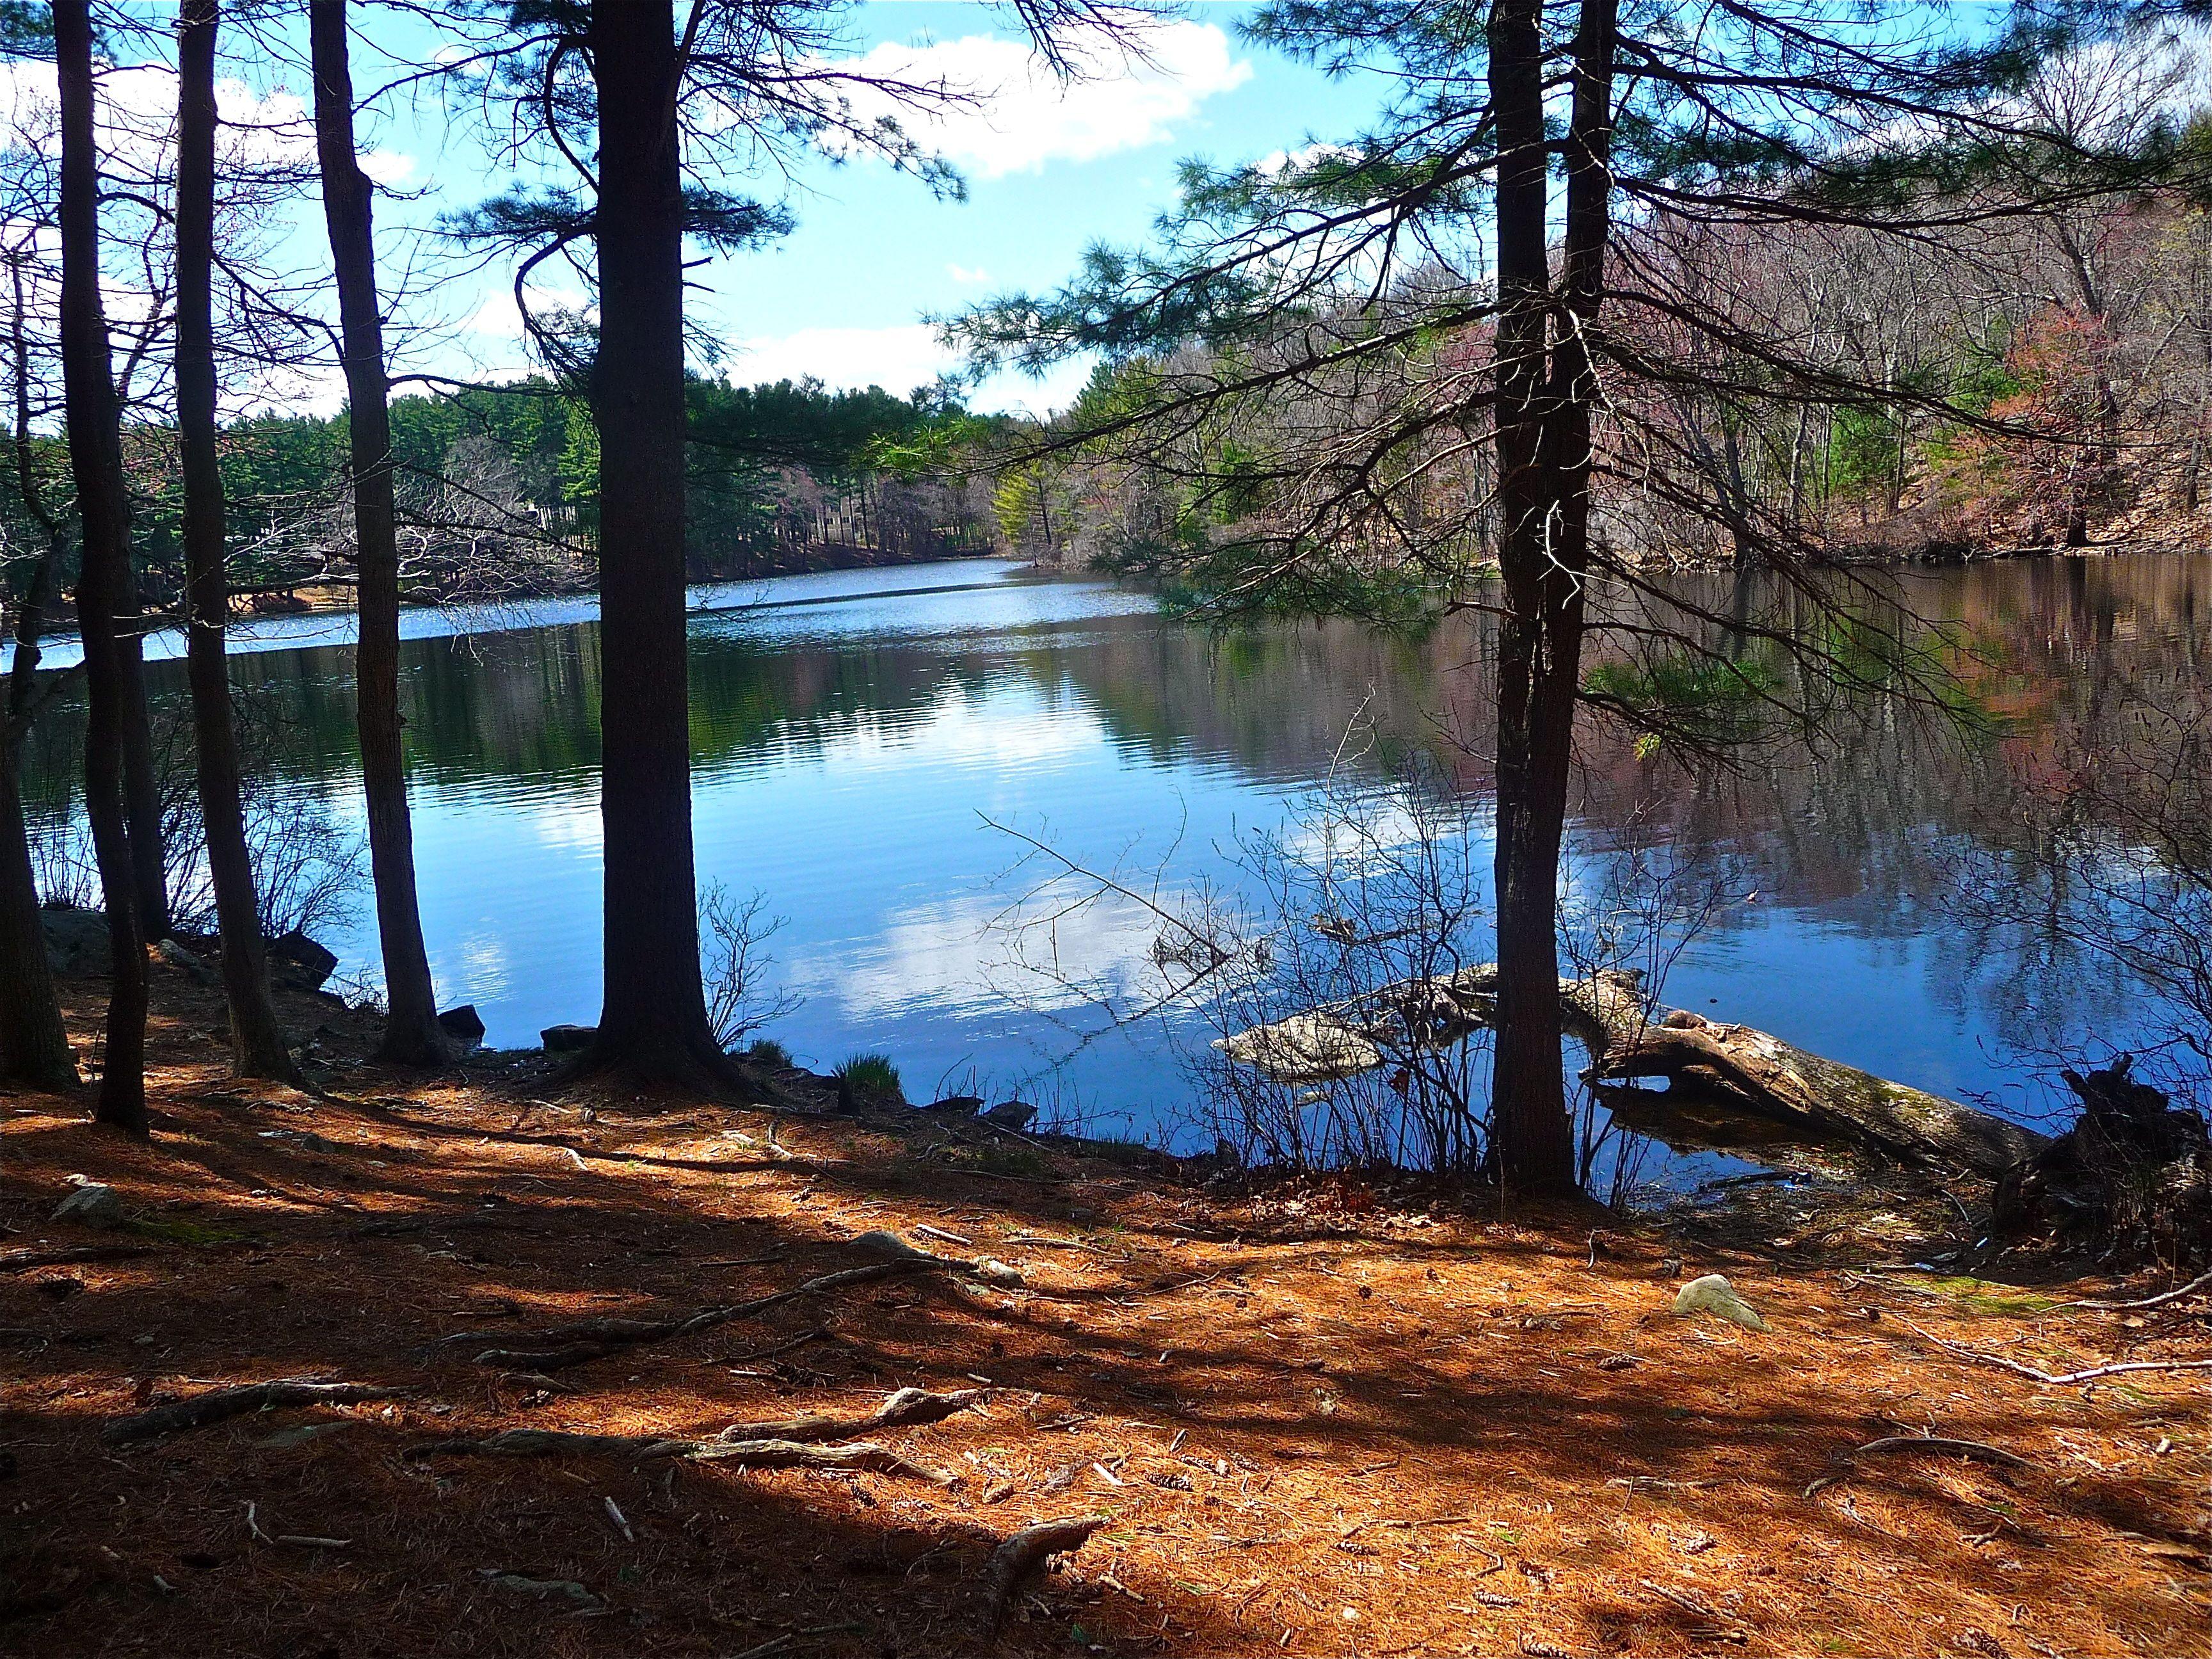 A New England spring day evolves at Highland Lake, Norfolk MA ...